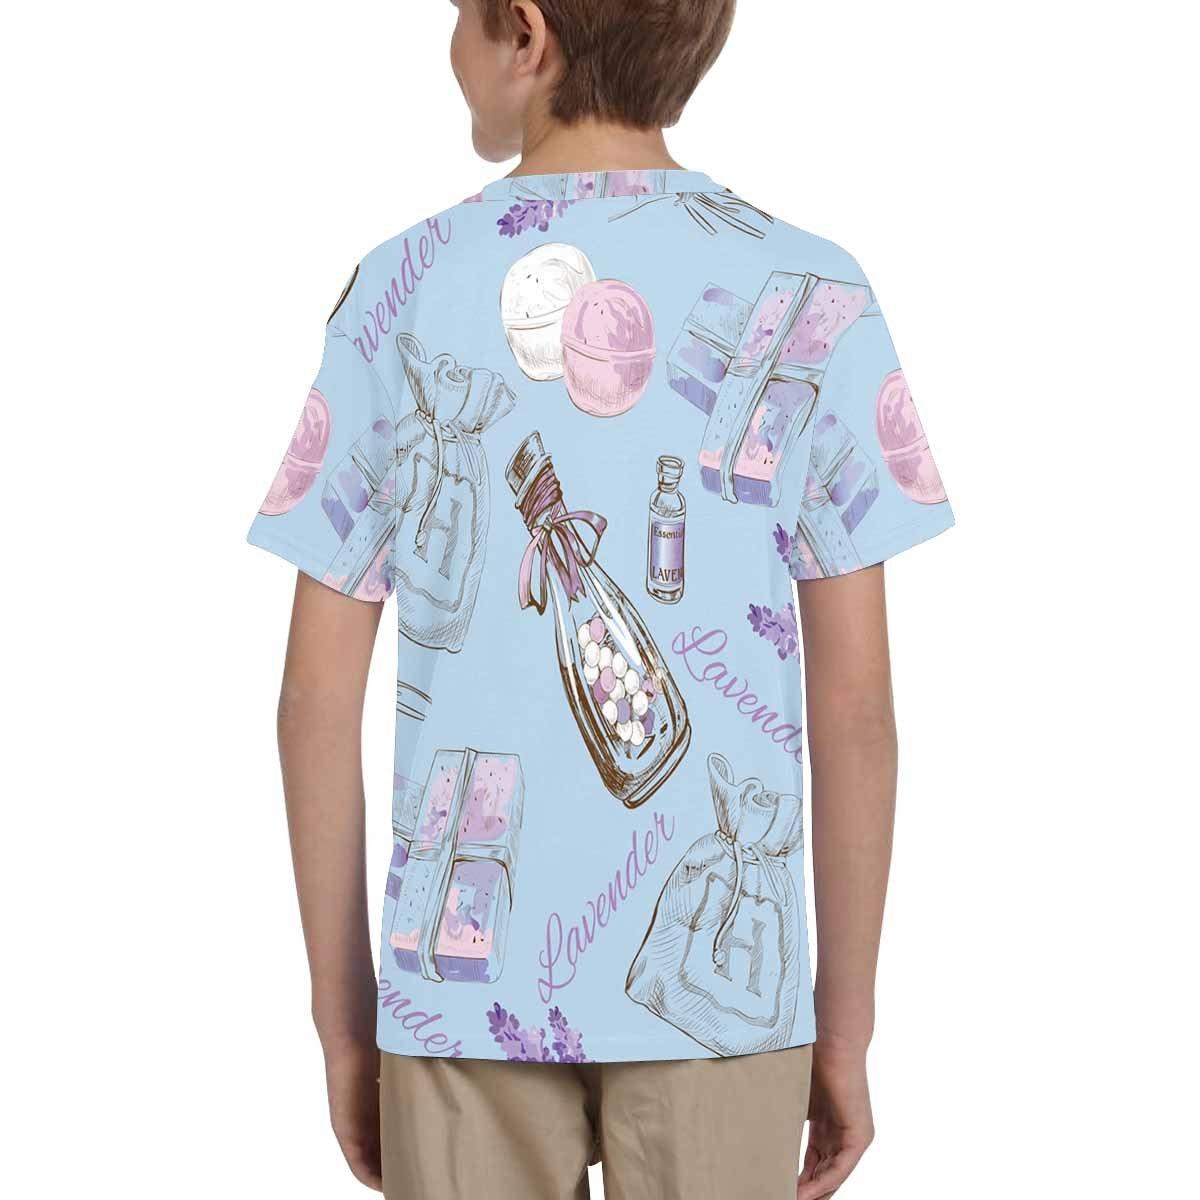 INTERESTPRINT Youth Crew Neck T-Shirt Lavender Pattern XS-XL